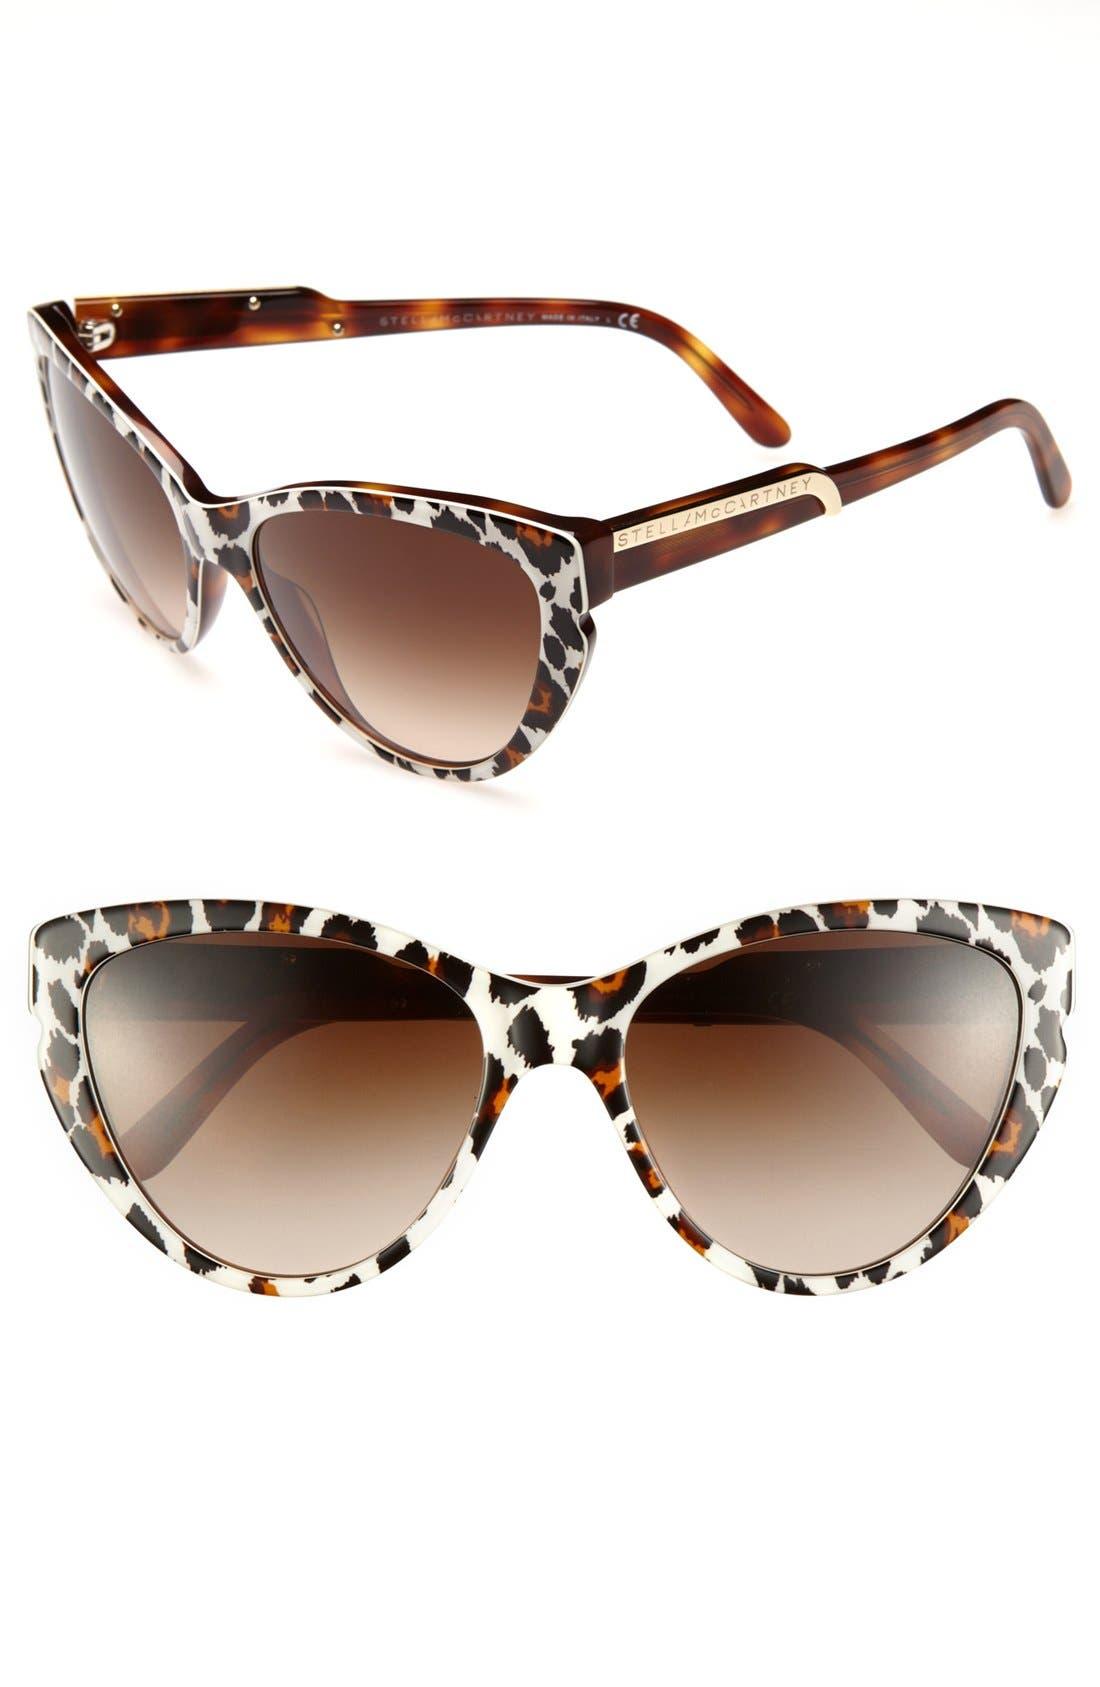 Main Image - Stella McCartney 59mm Cat's Eye Sunglasses